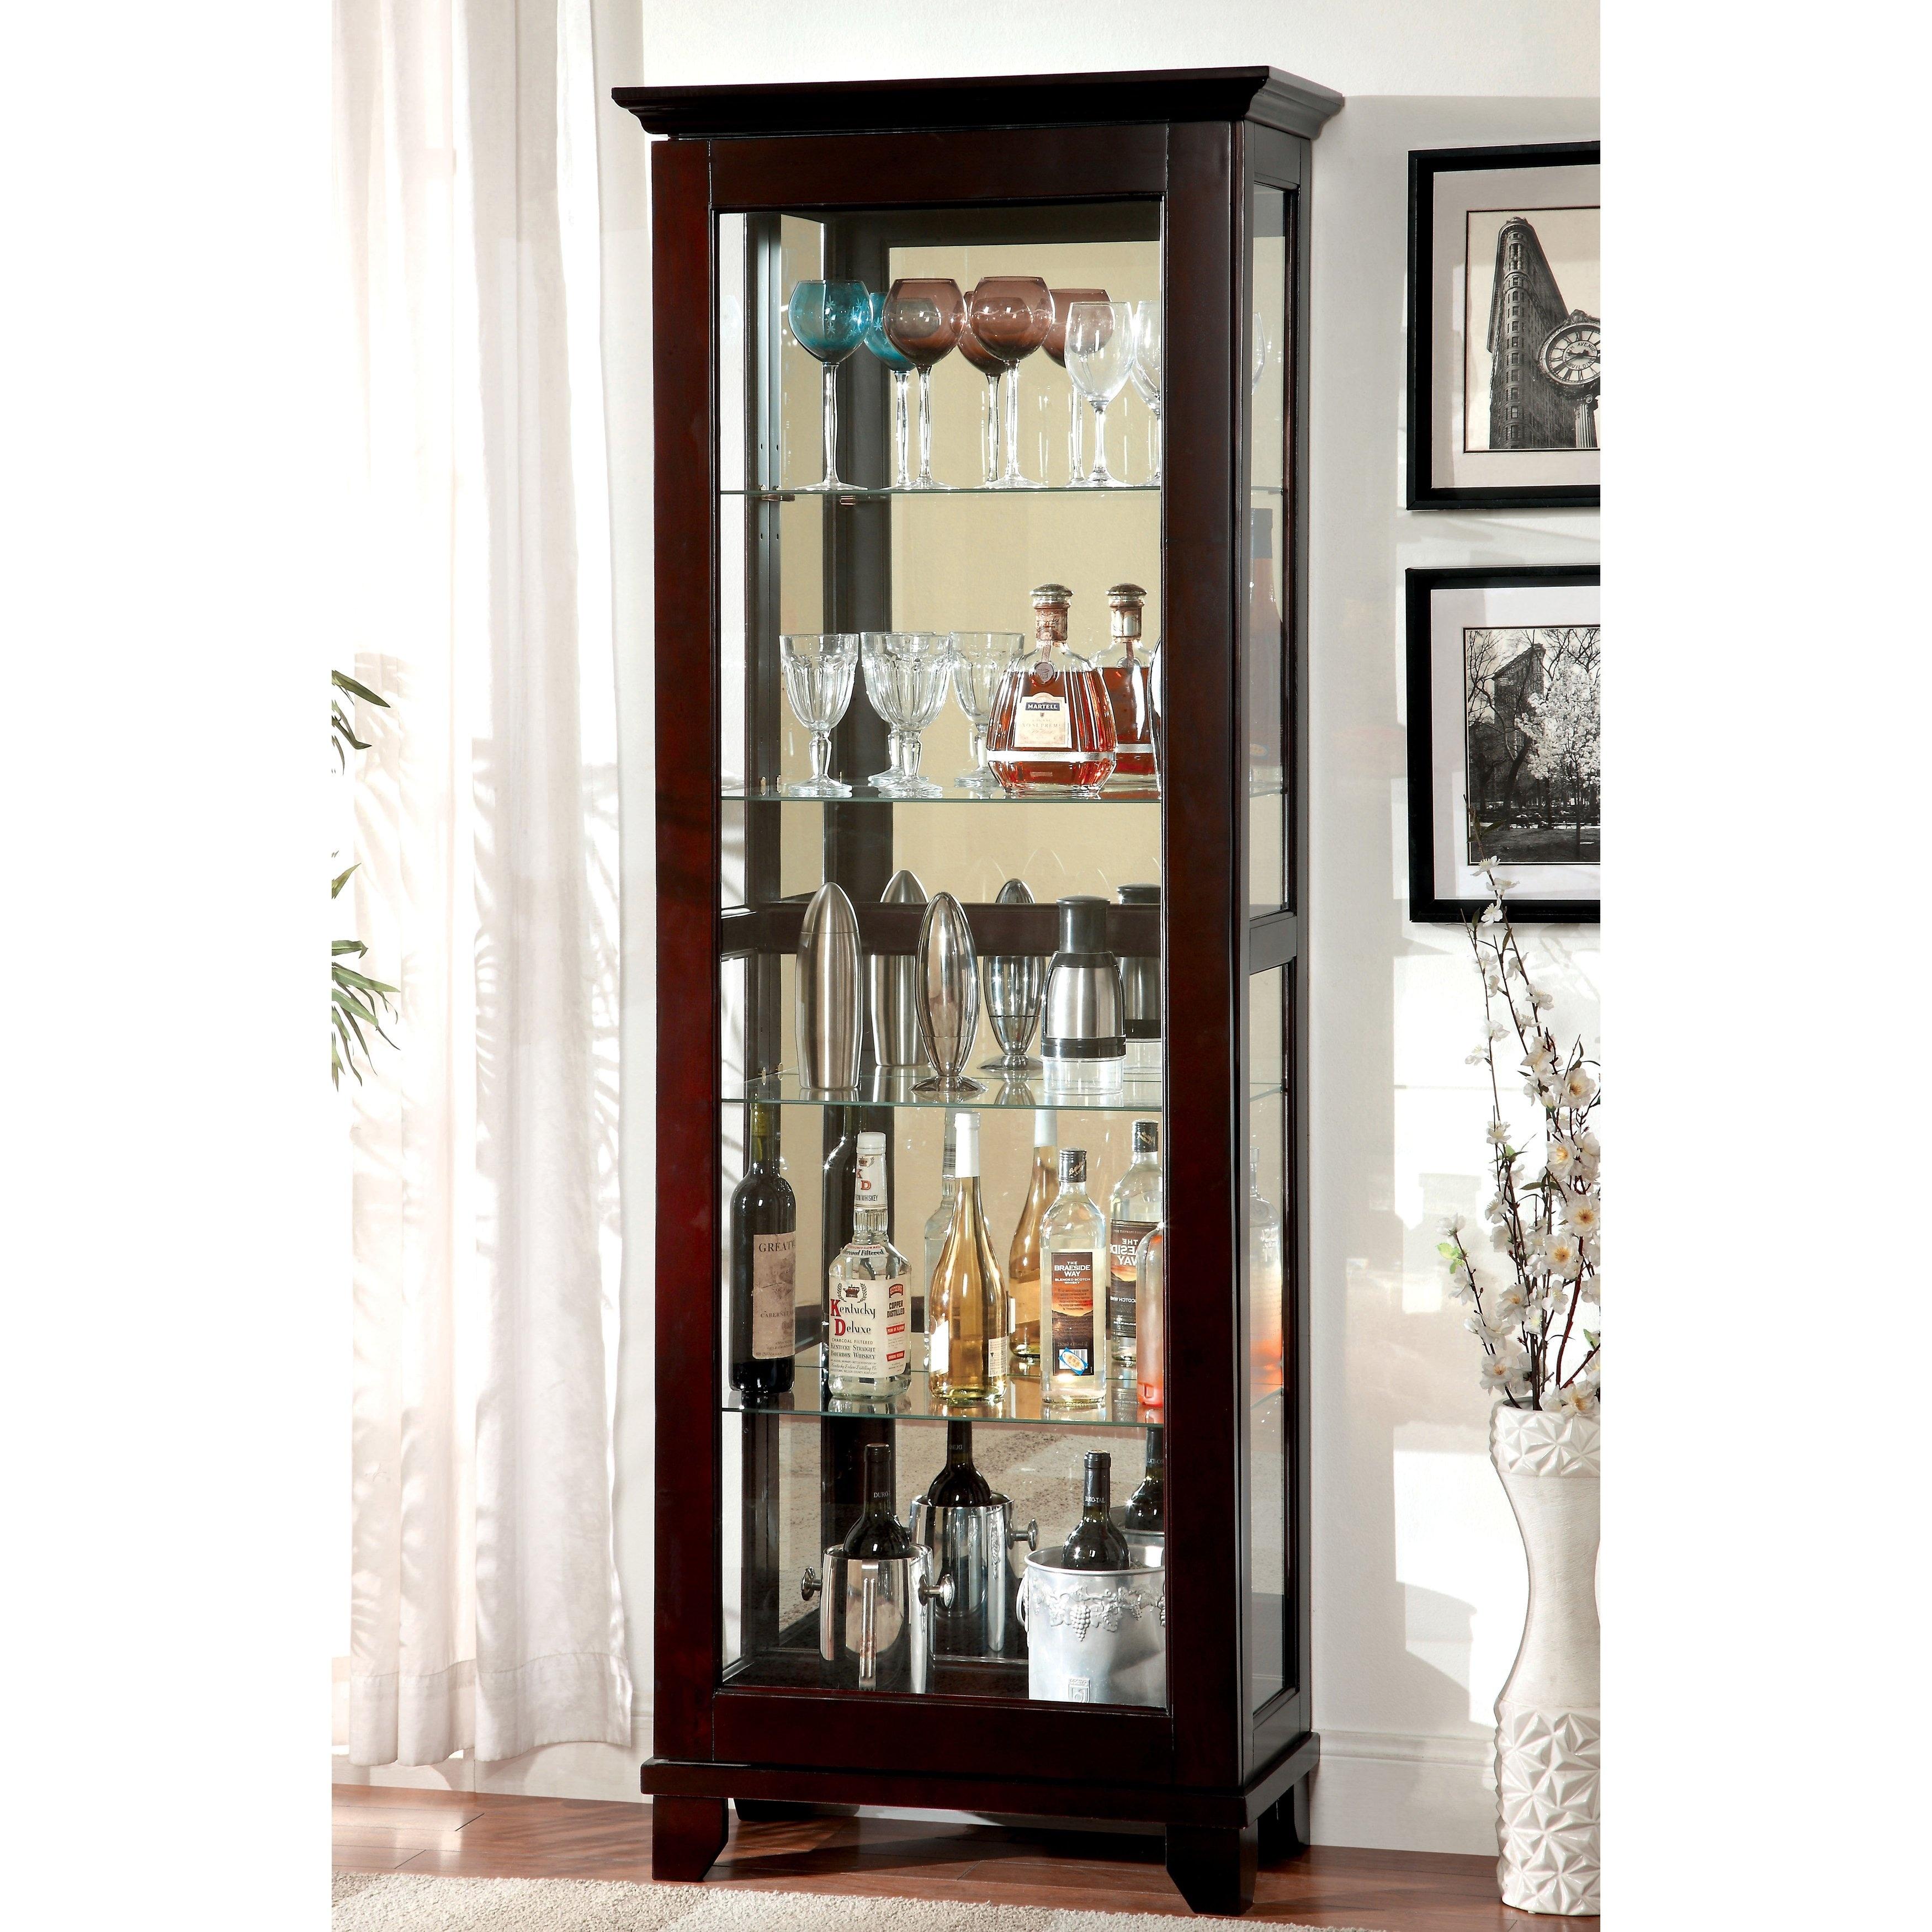 Furniture Of America Trav Contemporary Walnut Solid Wood Curio Cabinet On Sale Overstock 10292330